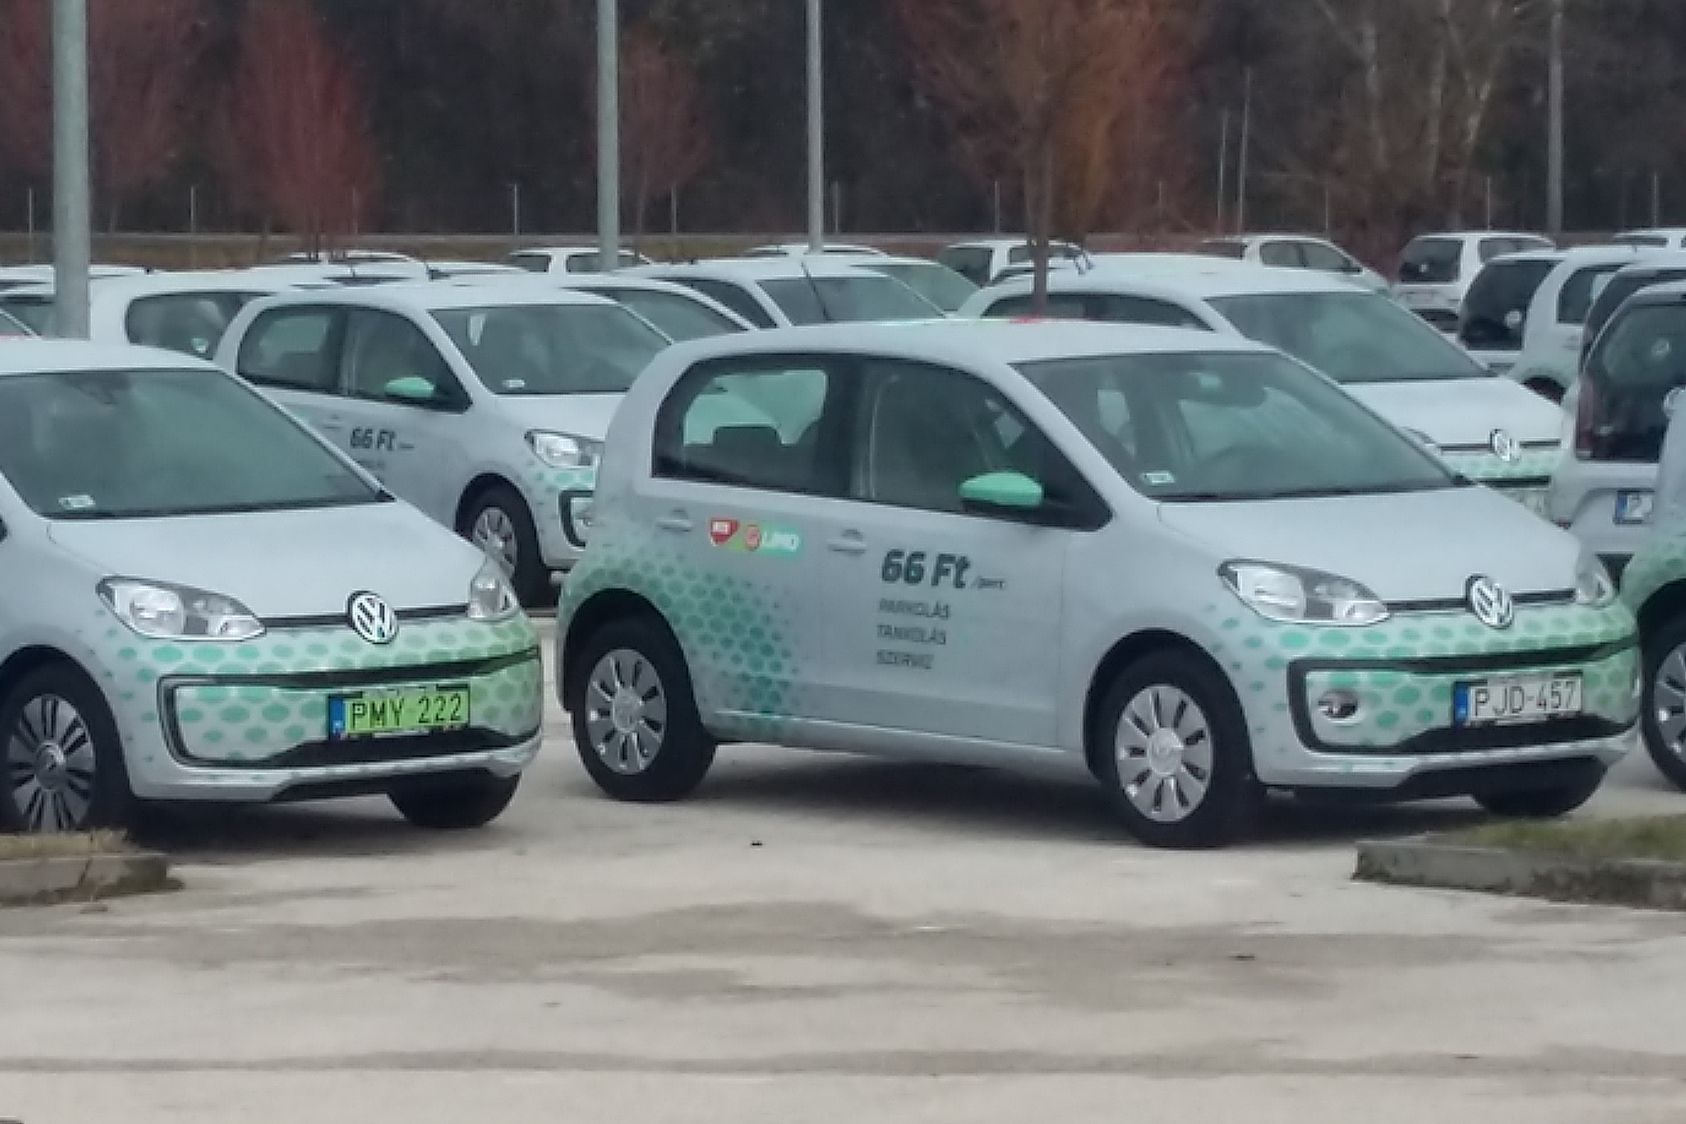 Mig Szeptemberig Havi   Volkswagen Up Kerult Forgalomba Hazankban Oktoberben Es Novemberben  Utobbi Gyakorlatilag A Mol Limo Flottaja